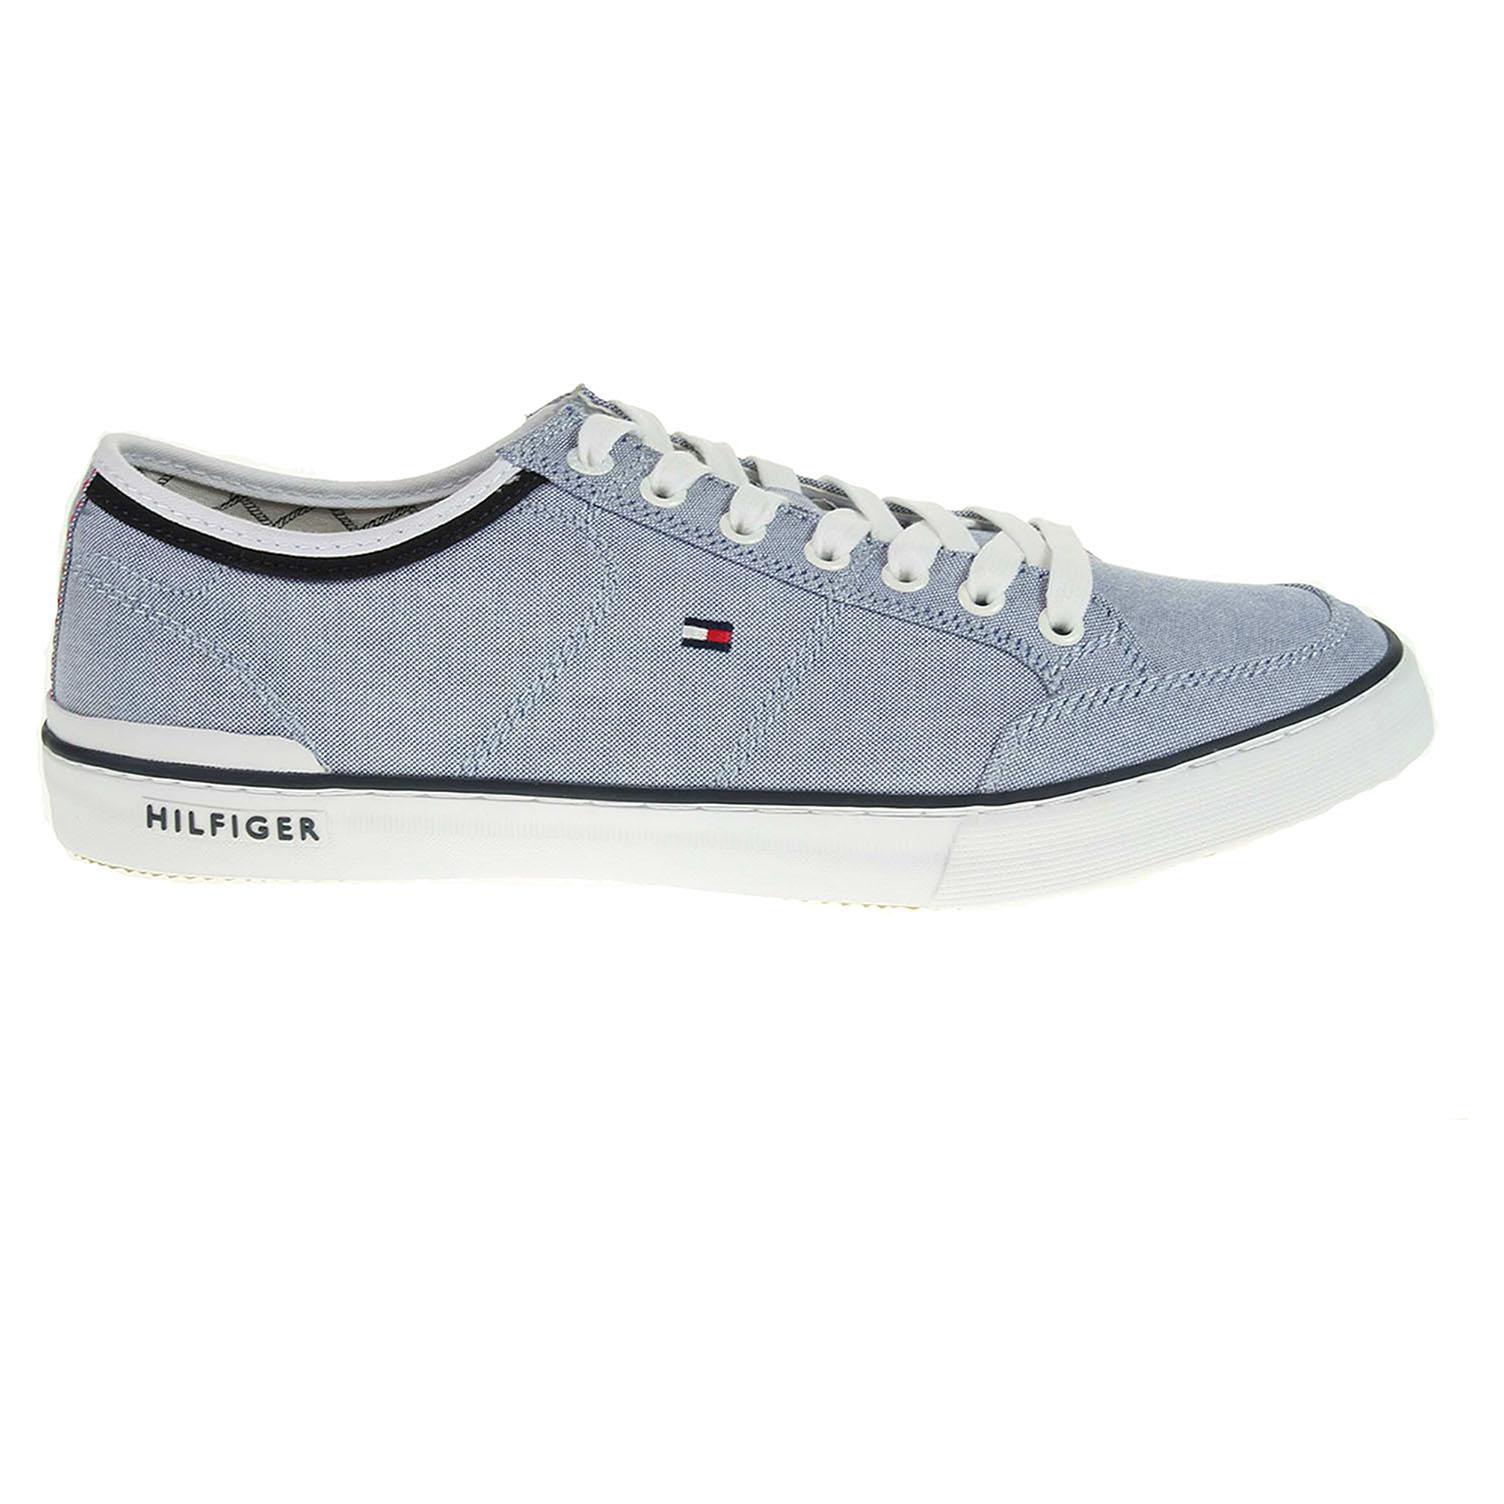 Ecco Tommy Hilfiger pánská obuv FM0FM00401 h2285arrington 5d1 modrá 24000432